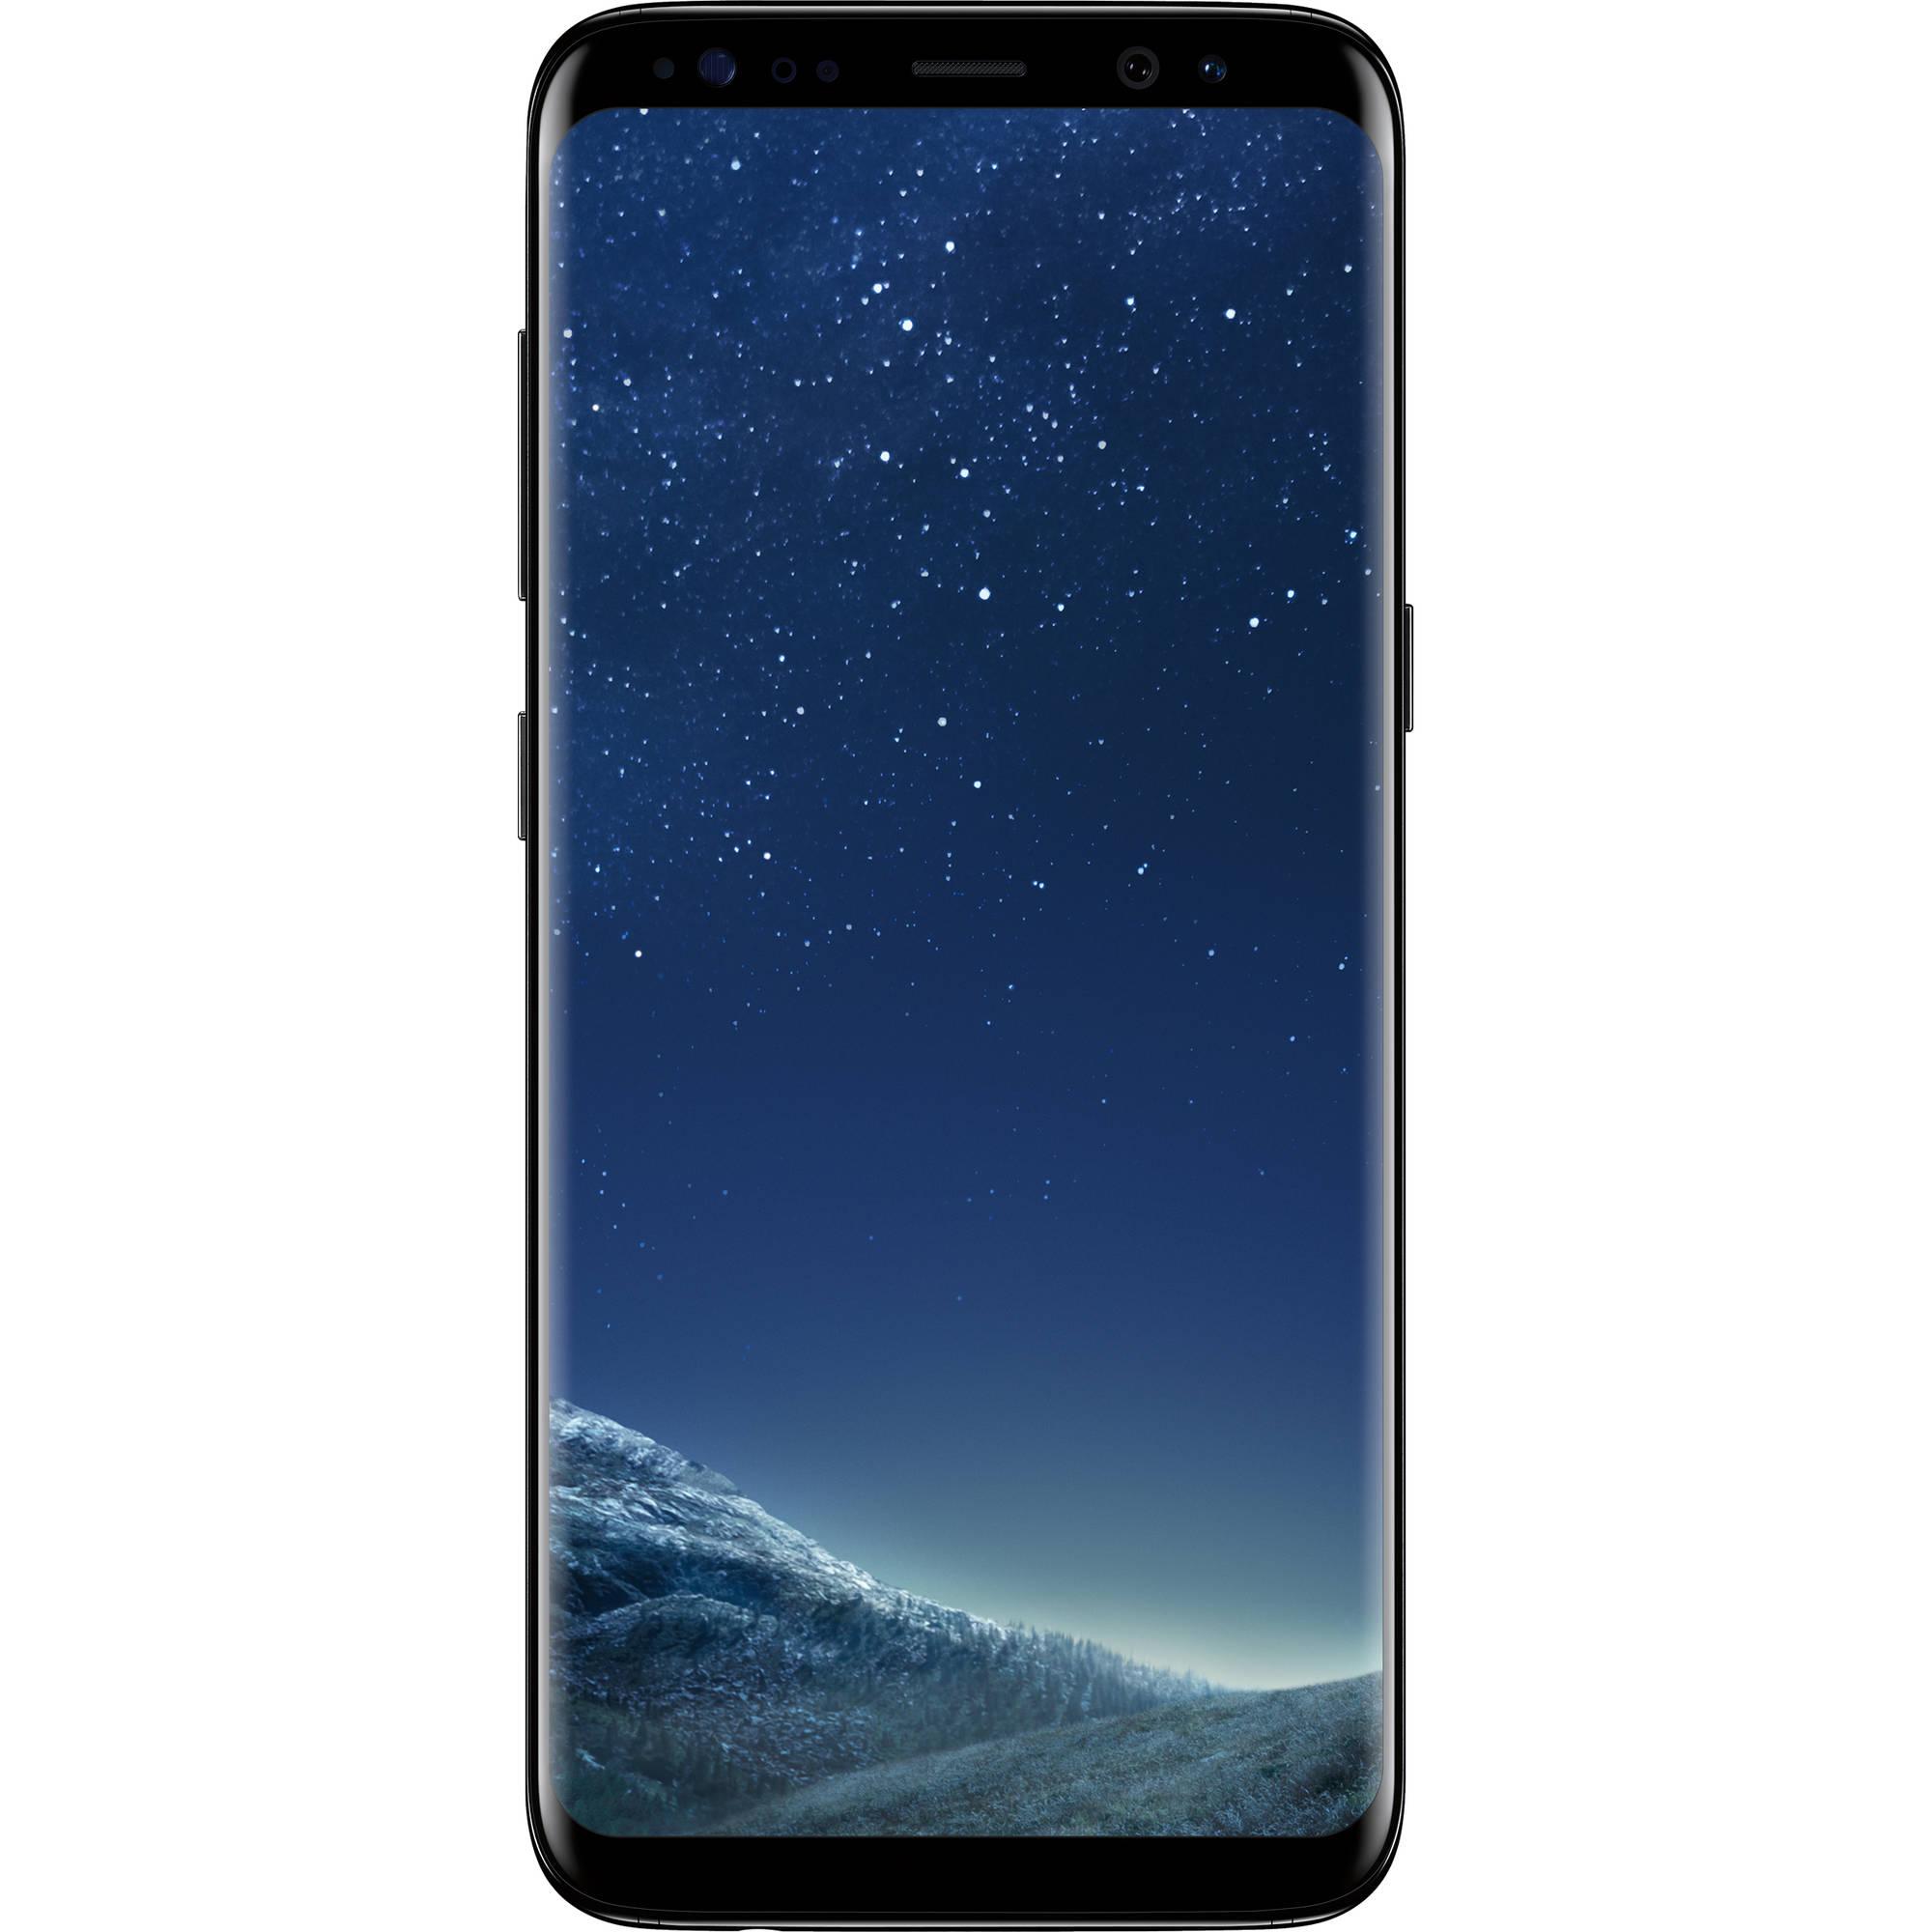 Samsung Galaxy S8 SM-G950U 64GB Smartphone (Unlocked, Midnight Black)